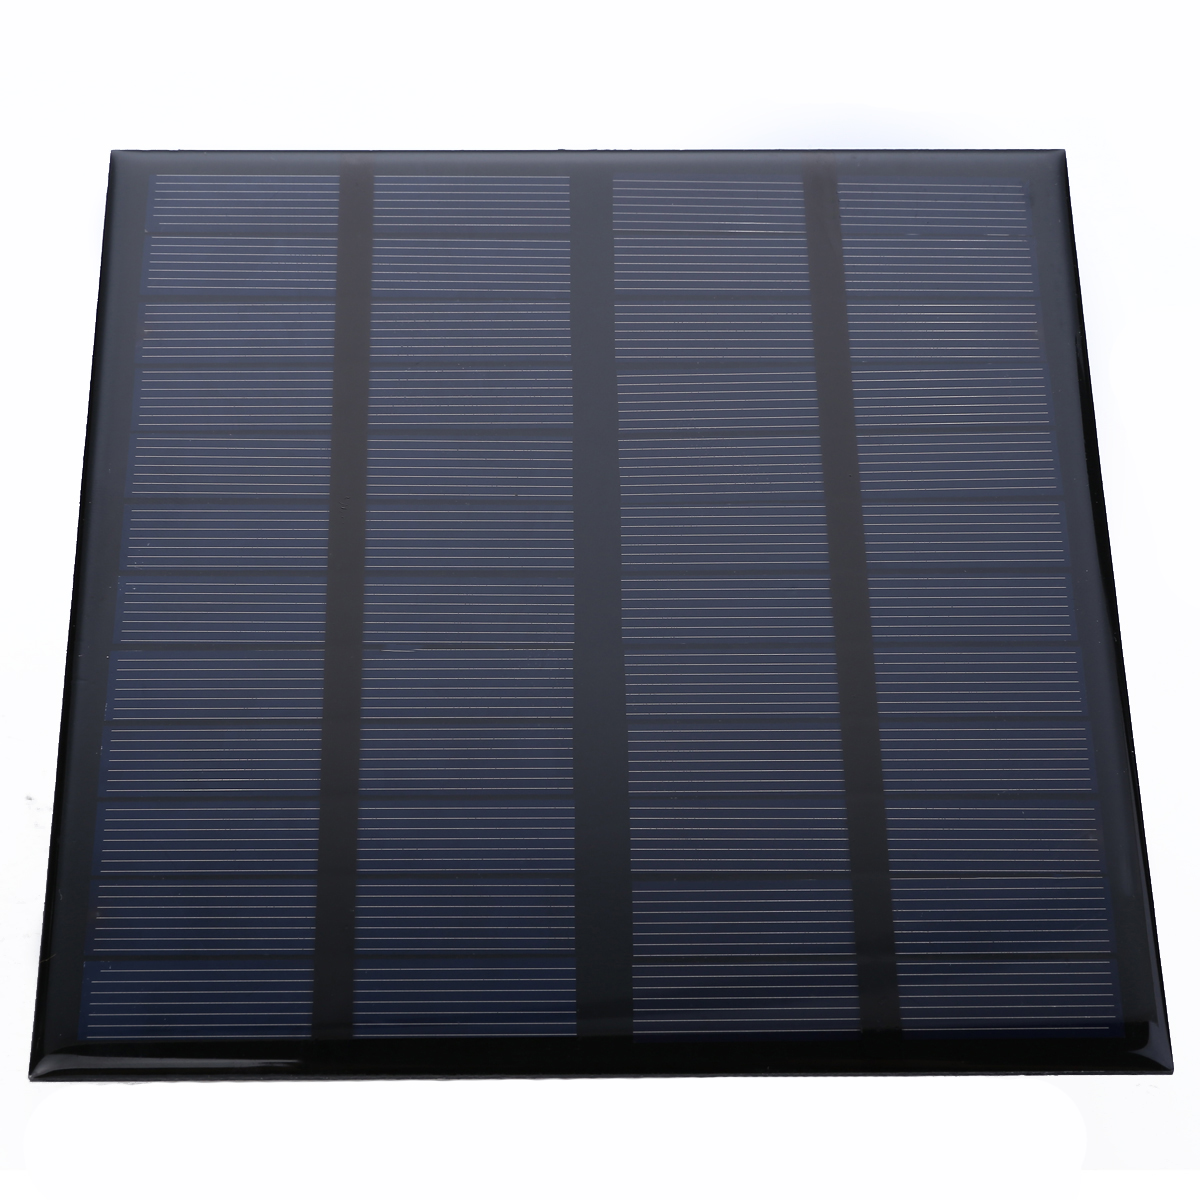 12V 3W Mini Portable Cell Solar Panel System DIY Battery Cell Charger Solar Panel Mayitr12V 3W Mini Portable Cell Solar Panel System DIY Battery Cell Charger Solar Panel Mayitr